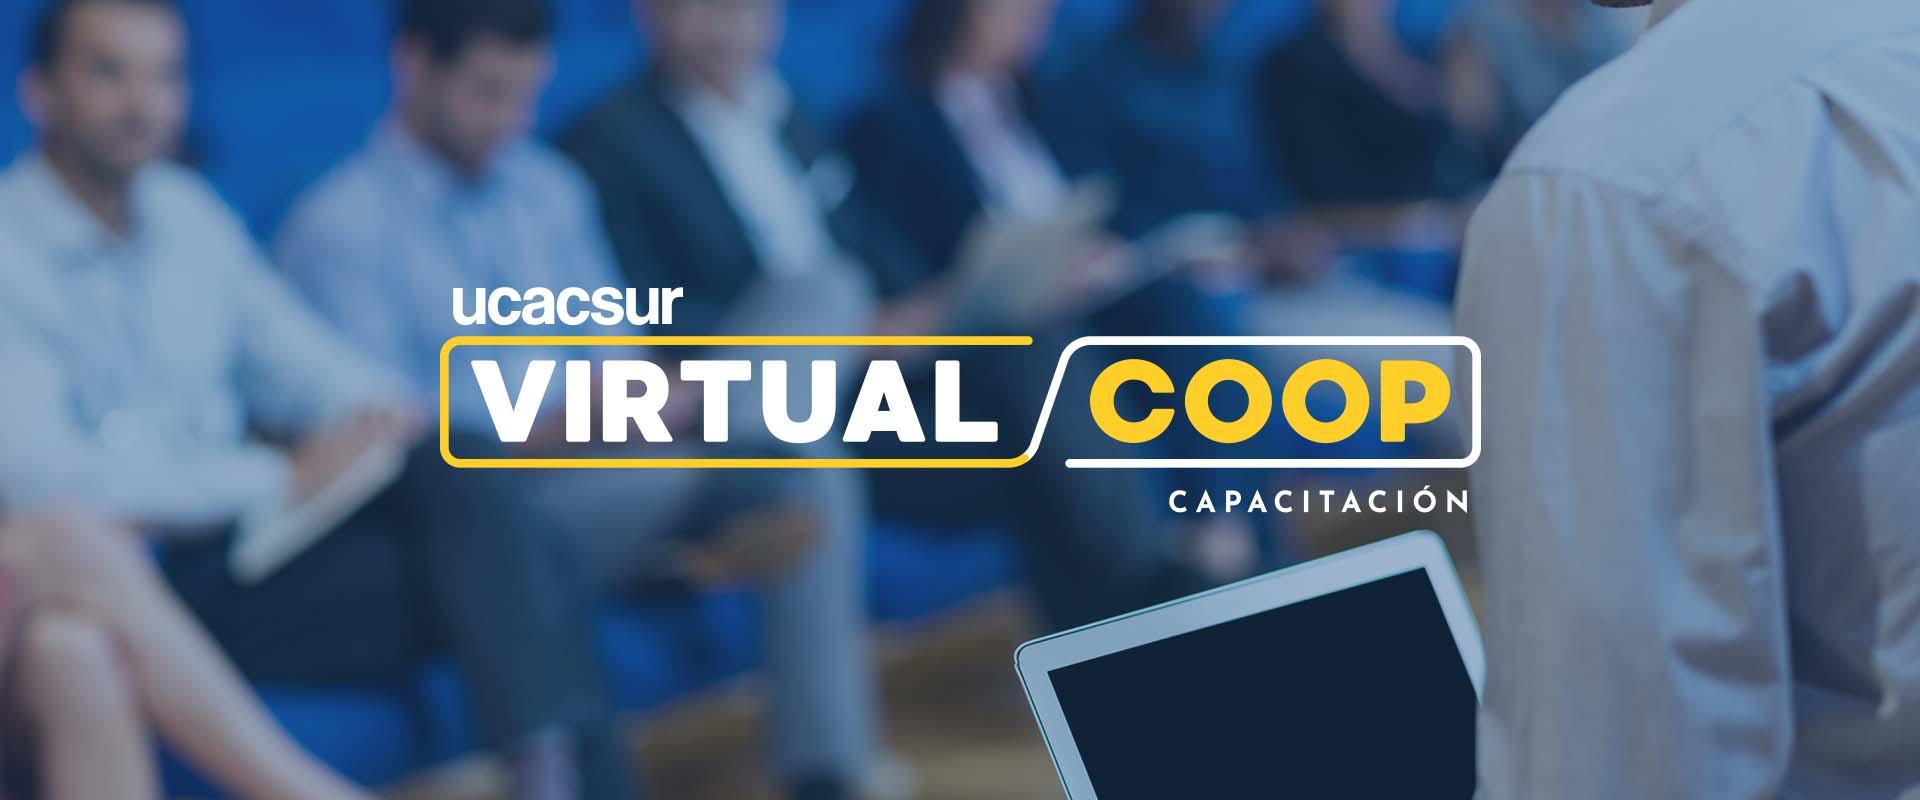 virtualcoop 2